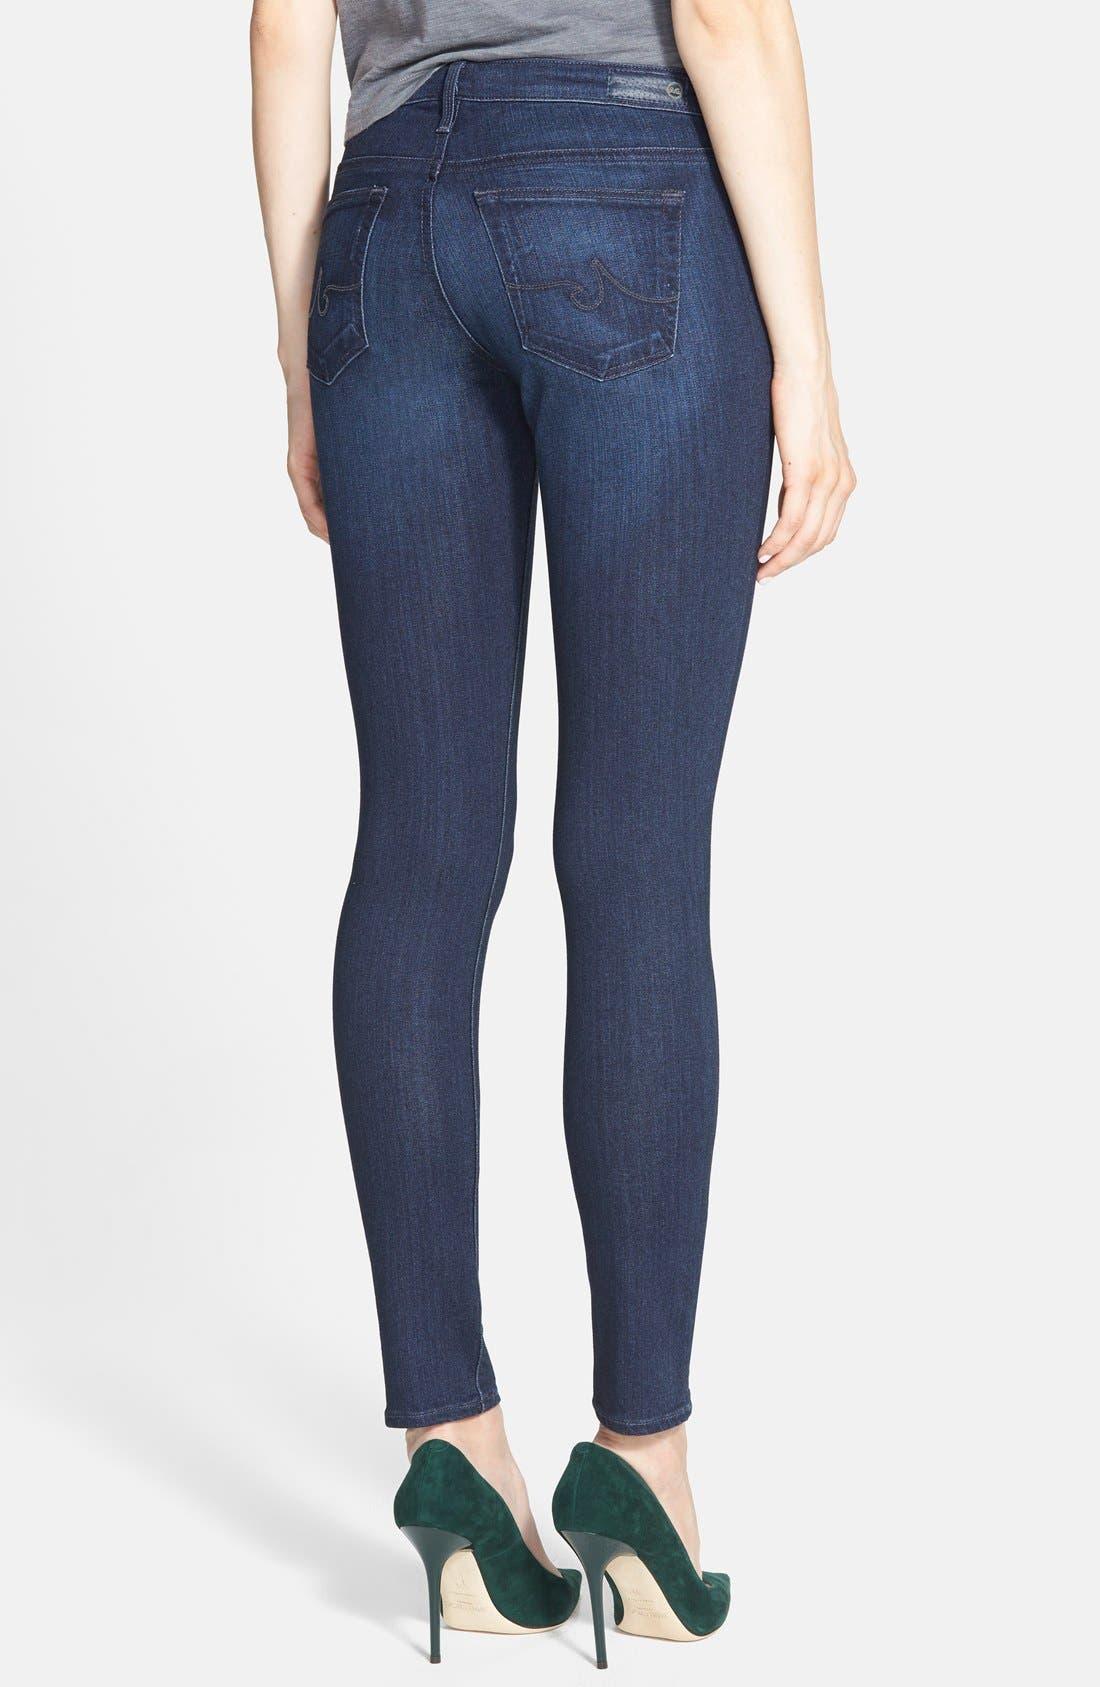 The Legging Ankle Super Skinny Jeans,                             Alternate thumbnail 8, color,                             COAL BLUE